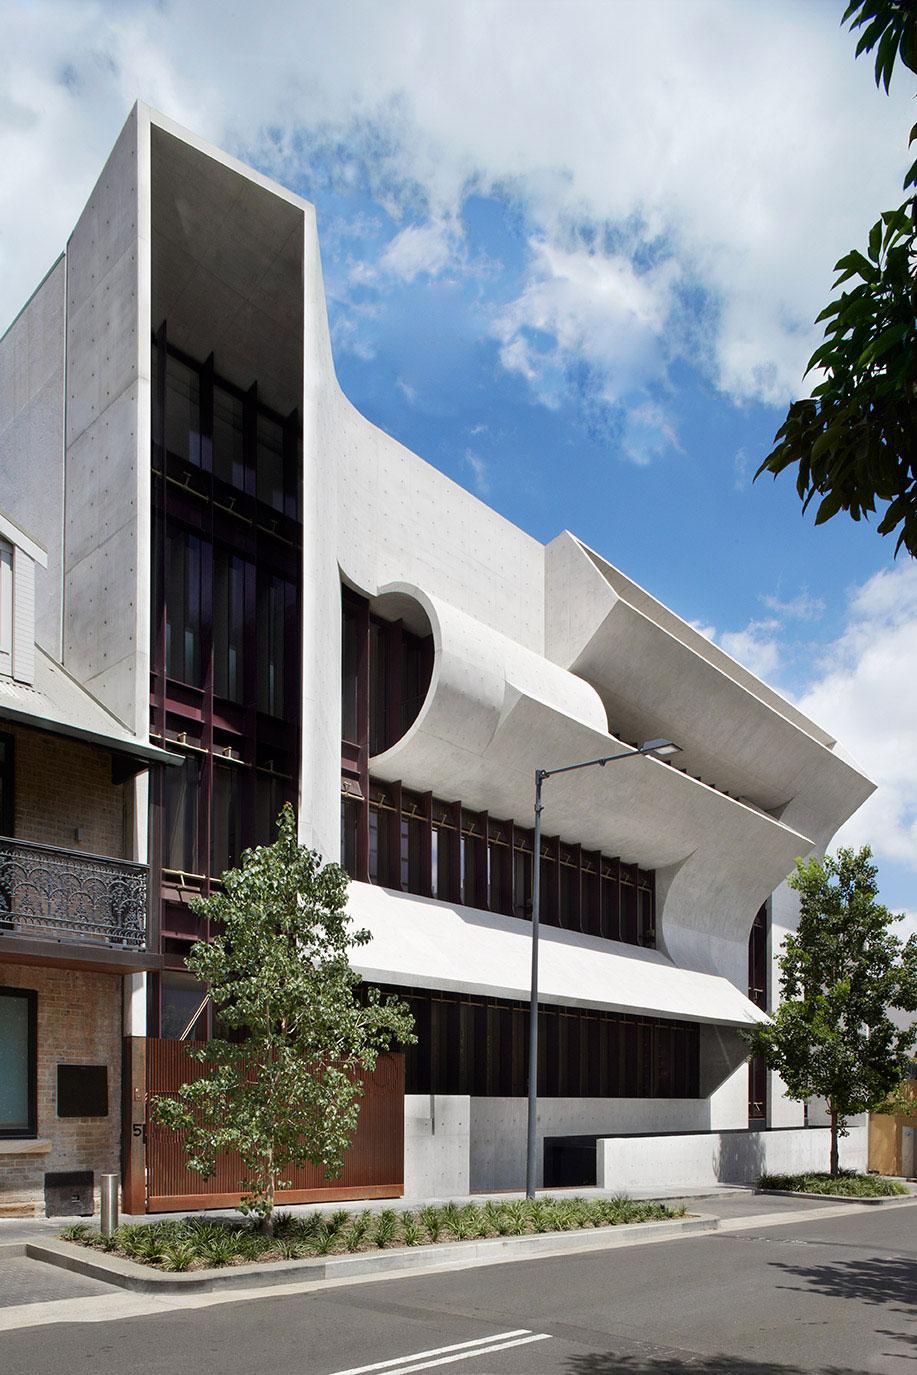 Smart-Design-Studio-Indigo-Slam-Australian-Architecture-Chippendale-NSW-Australia-Interior-Design-Image-1